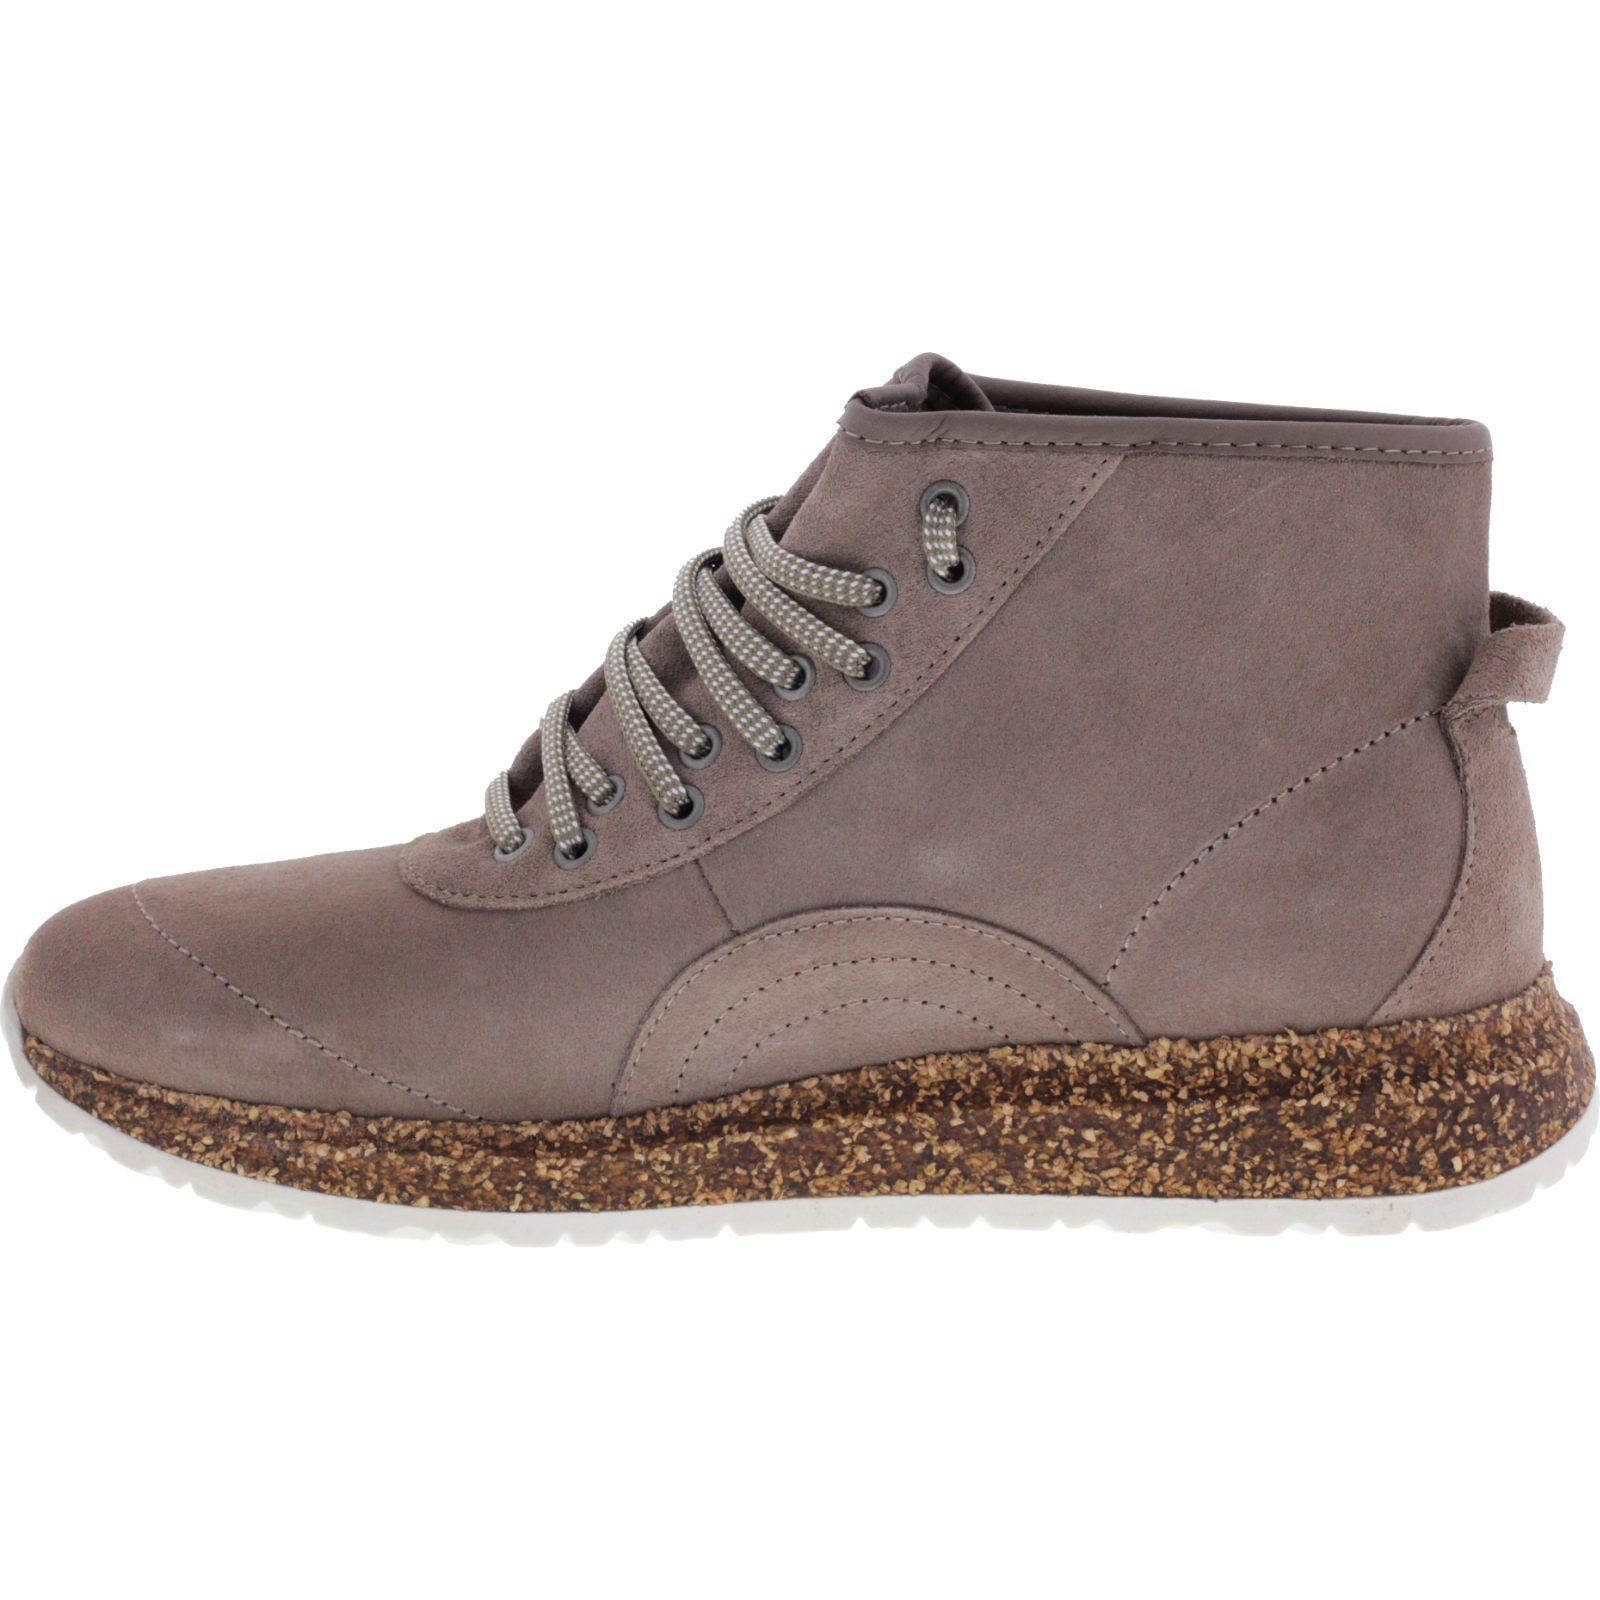 7194a0916b93ca ... Vorschau  Birkenstock Shoes   Modell  Atlin   Taupe Velours   Leder    Weite  ...